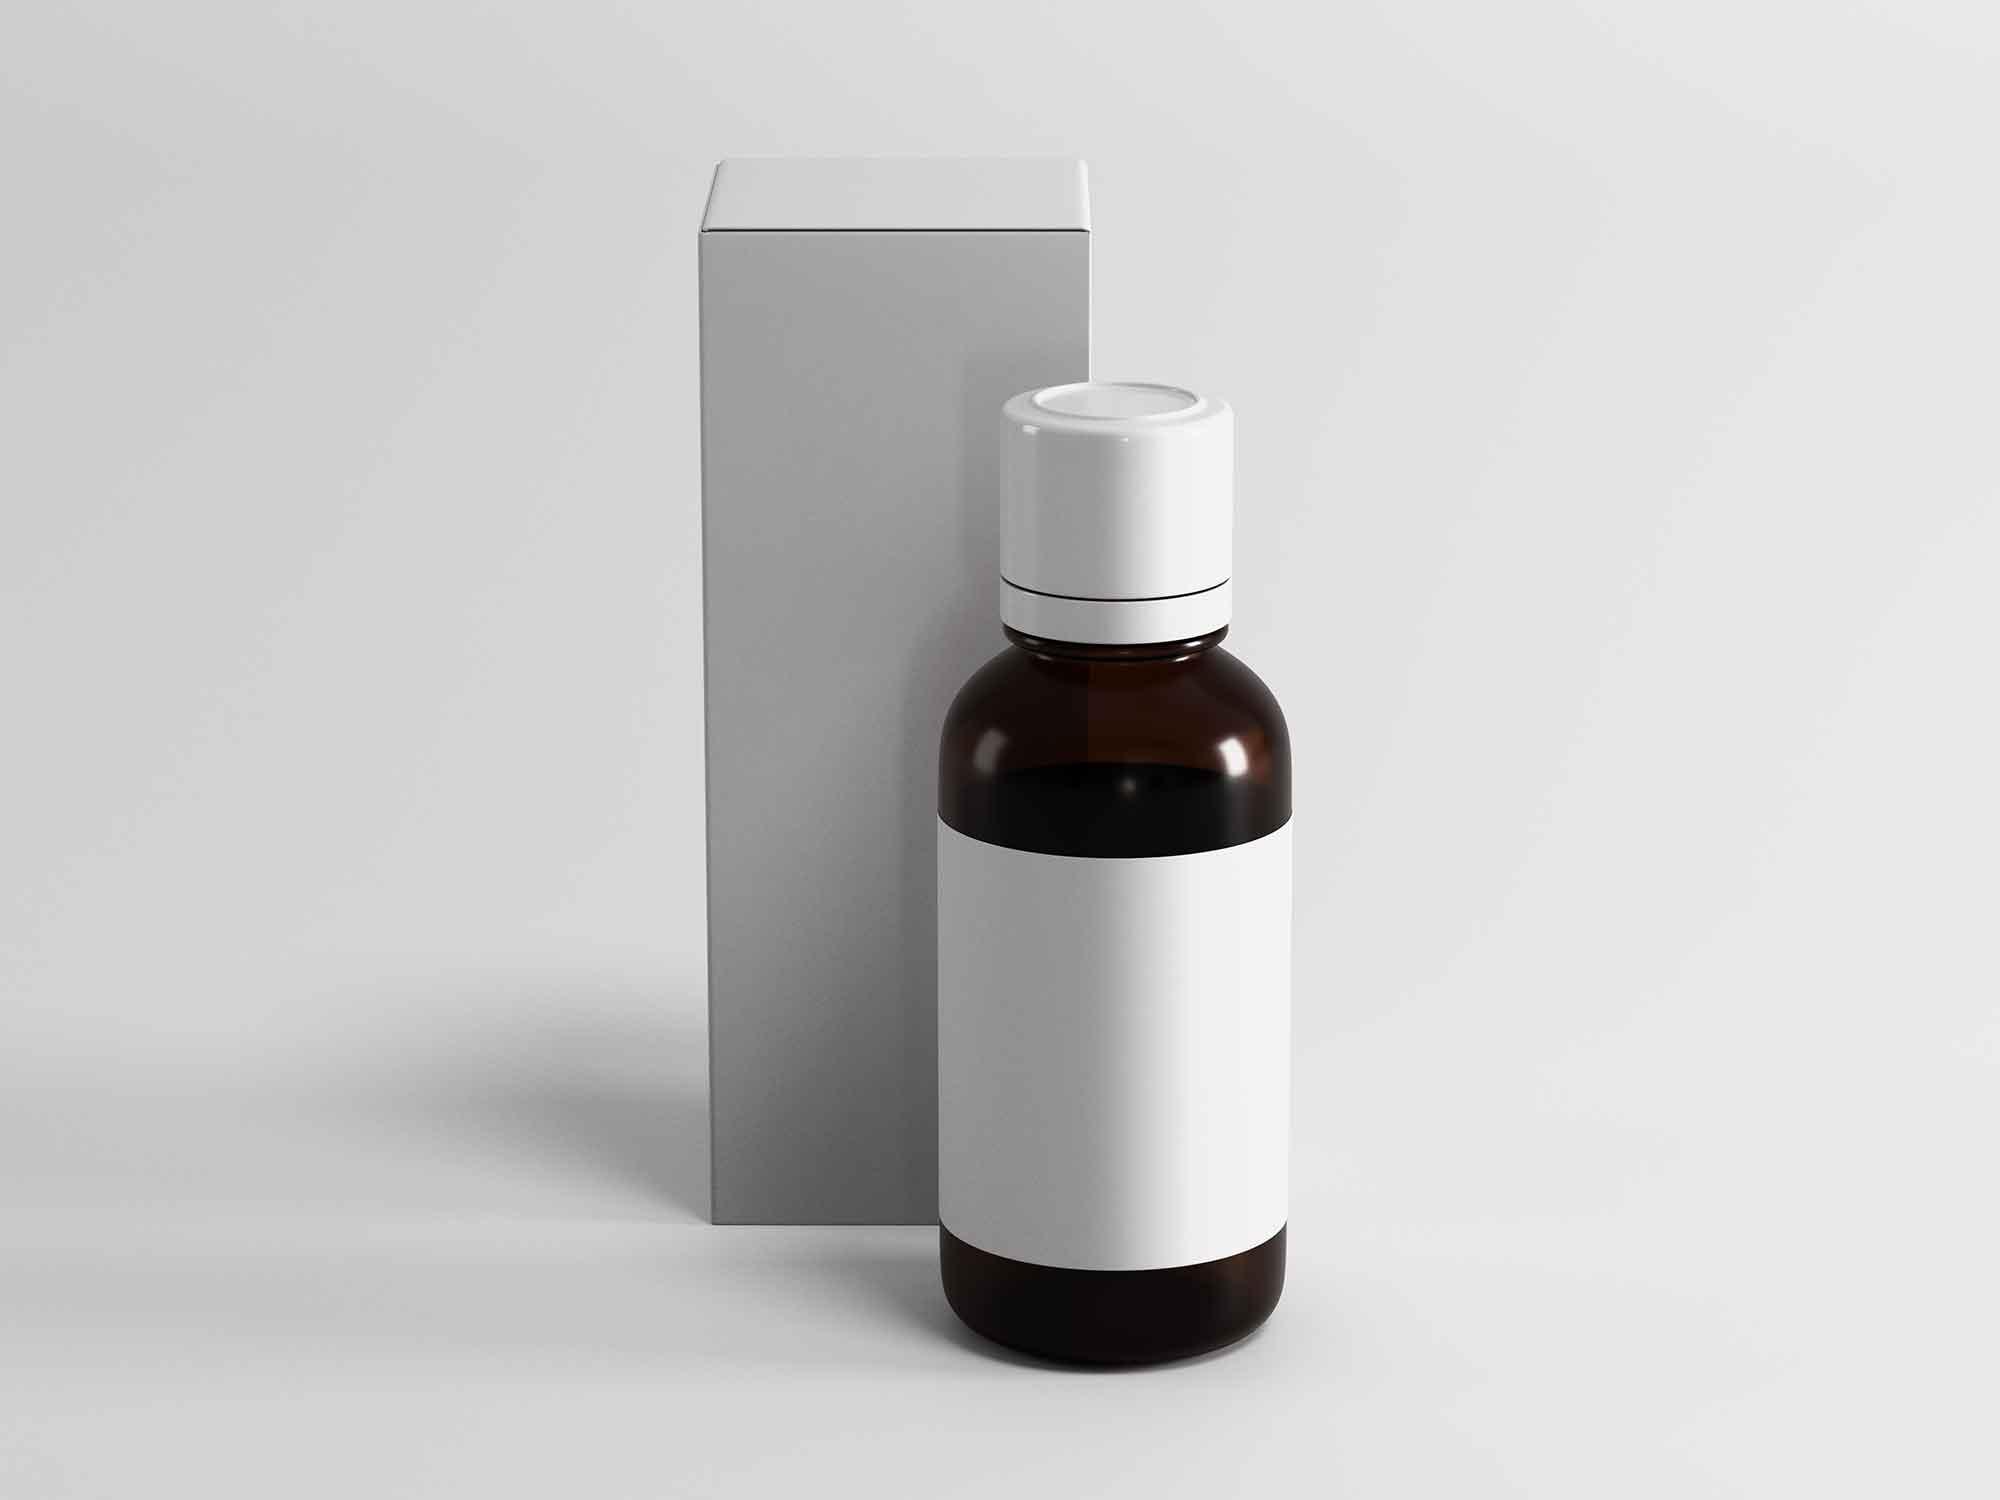 Medicine Bottle and Box Packaging Mockup 2